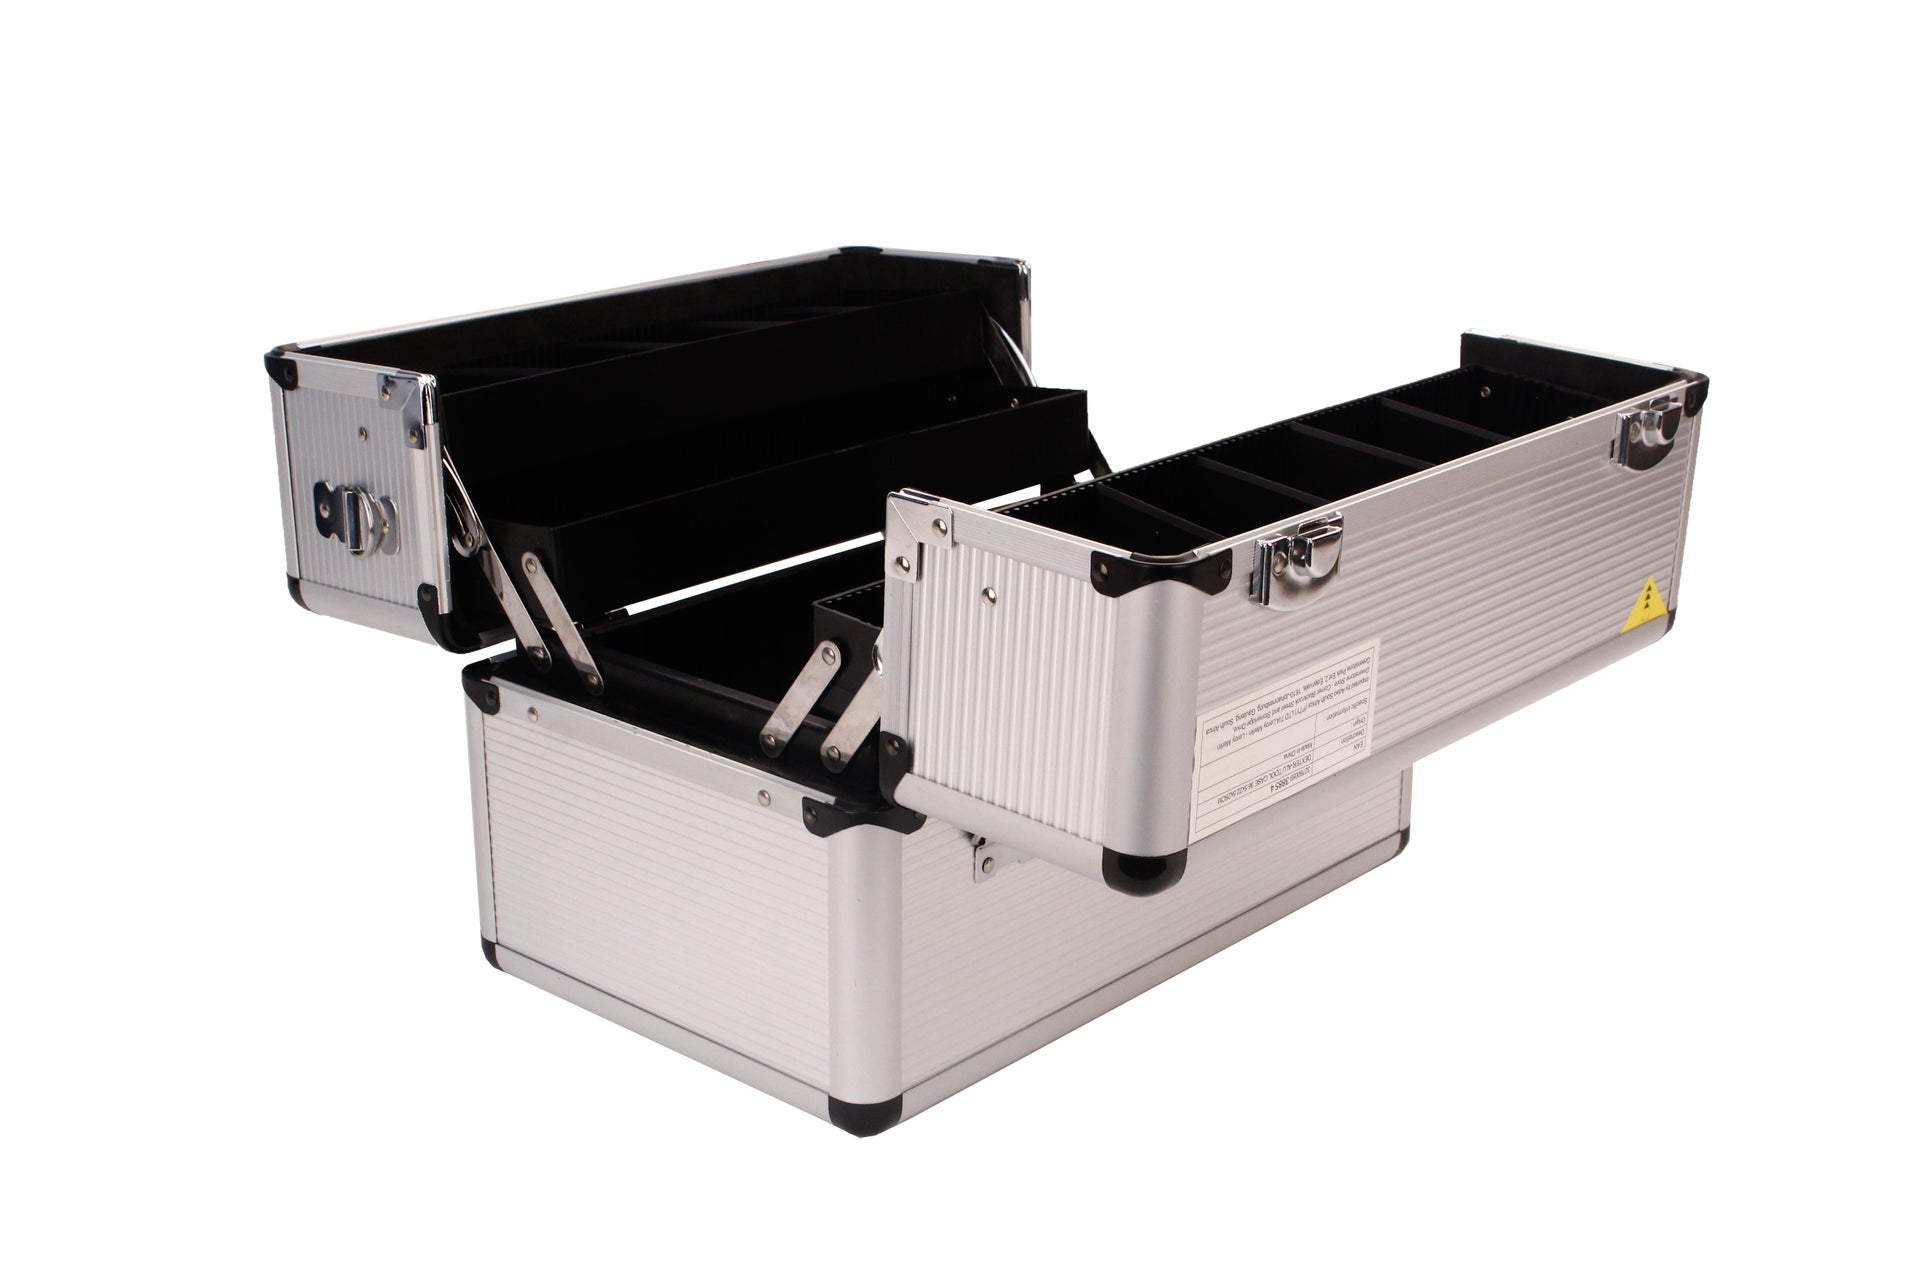 Cassetta attrezzi DEXTER L 22.5 x H 36.5 cm, profondità 250 mm - 3